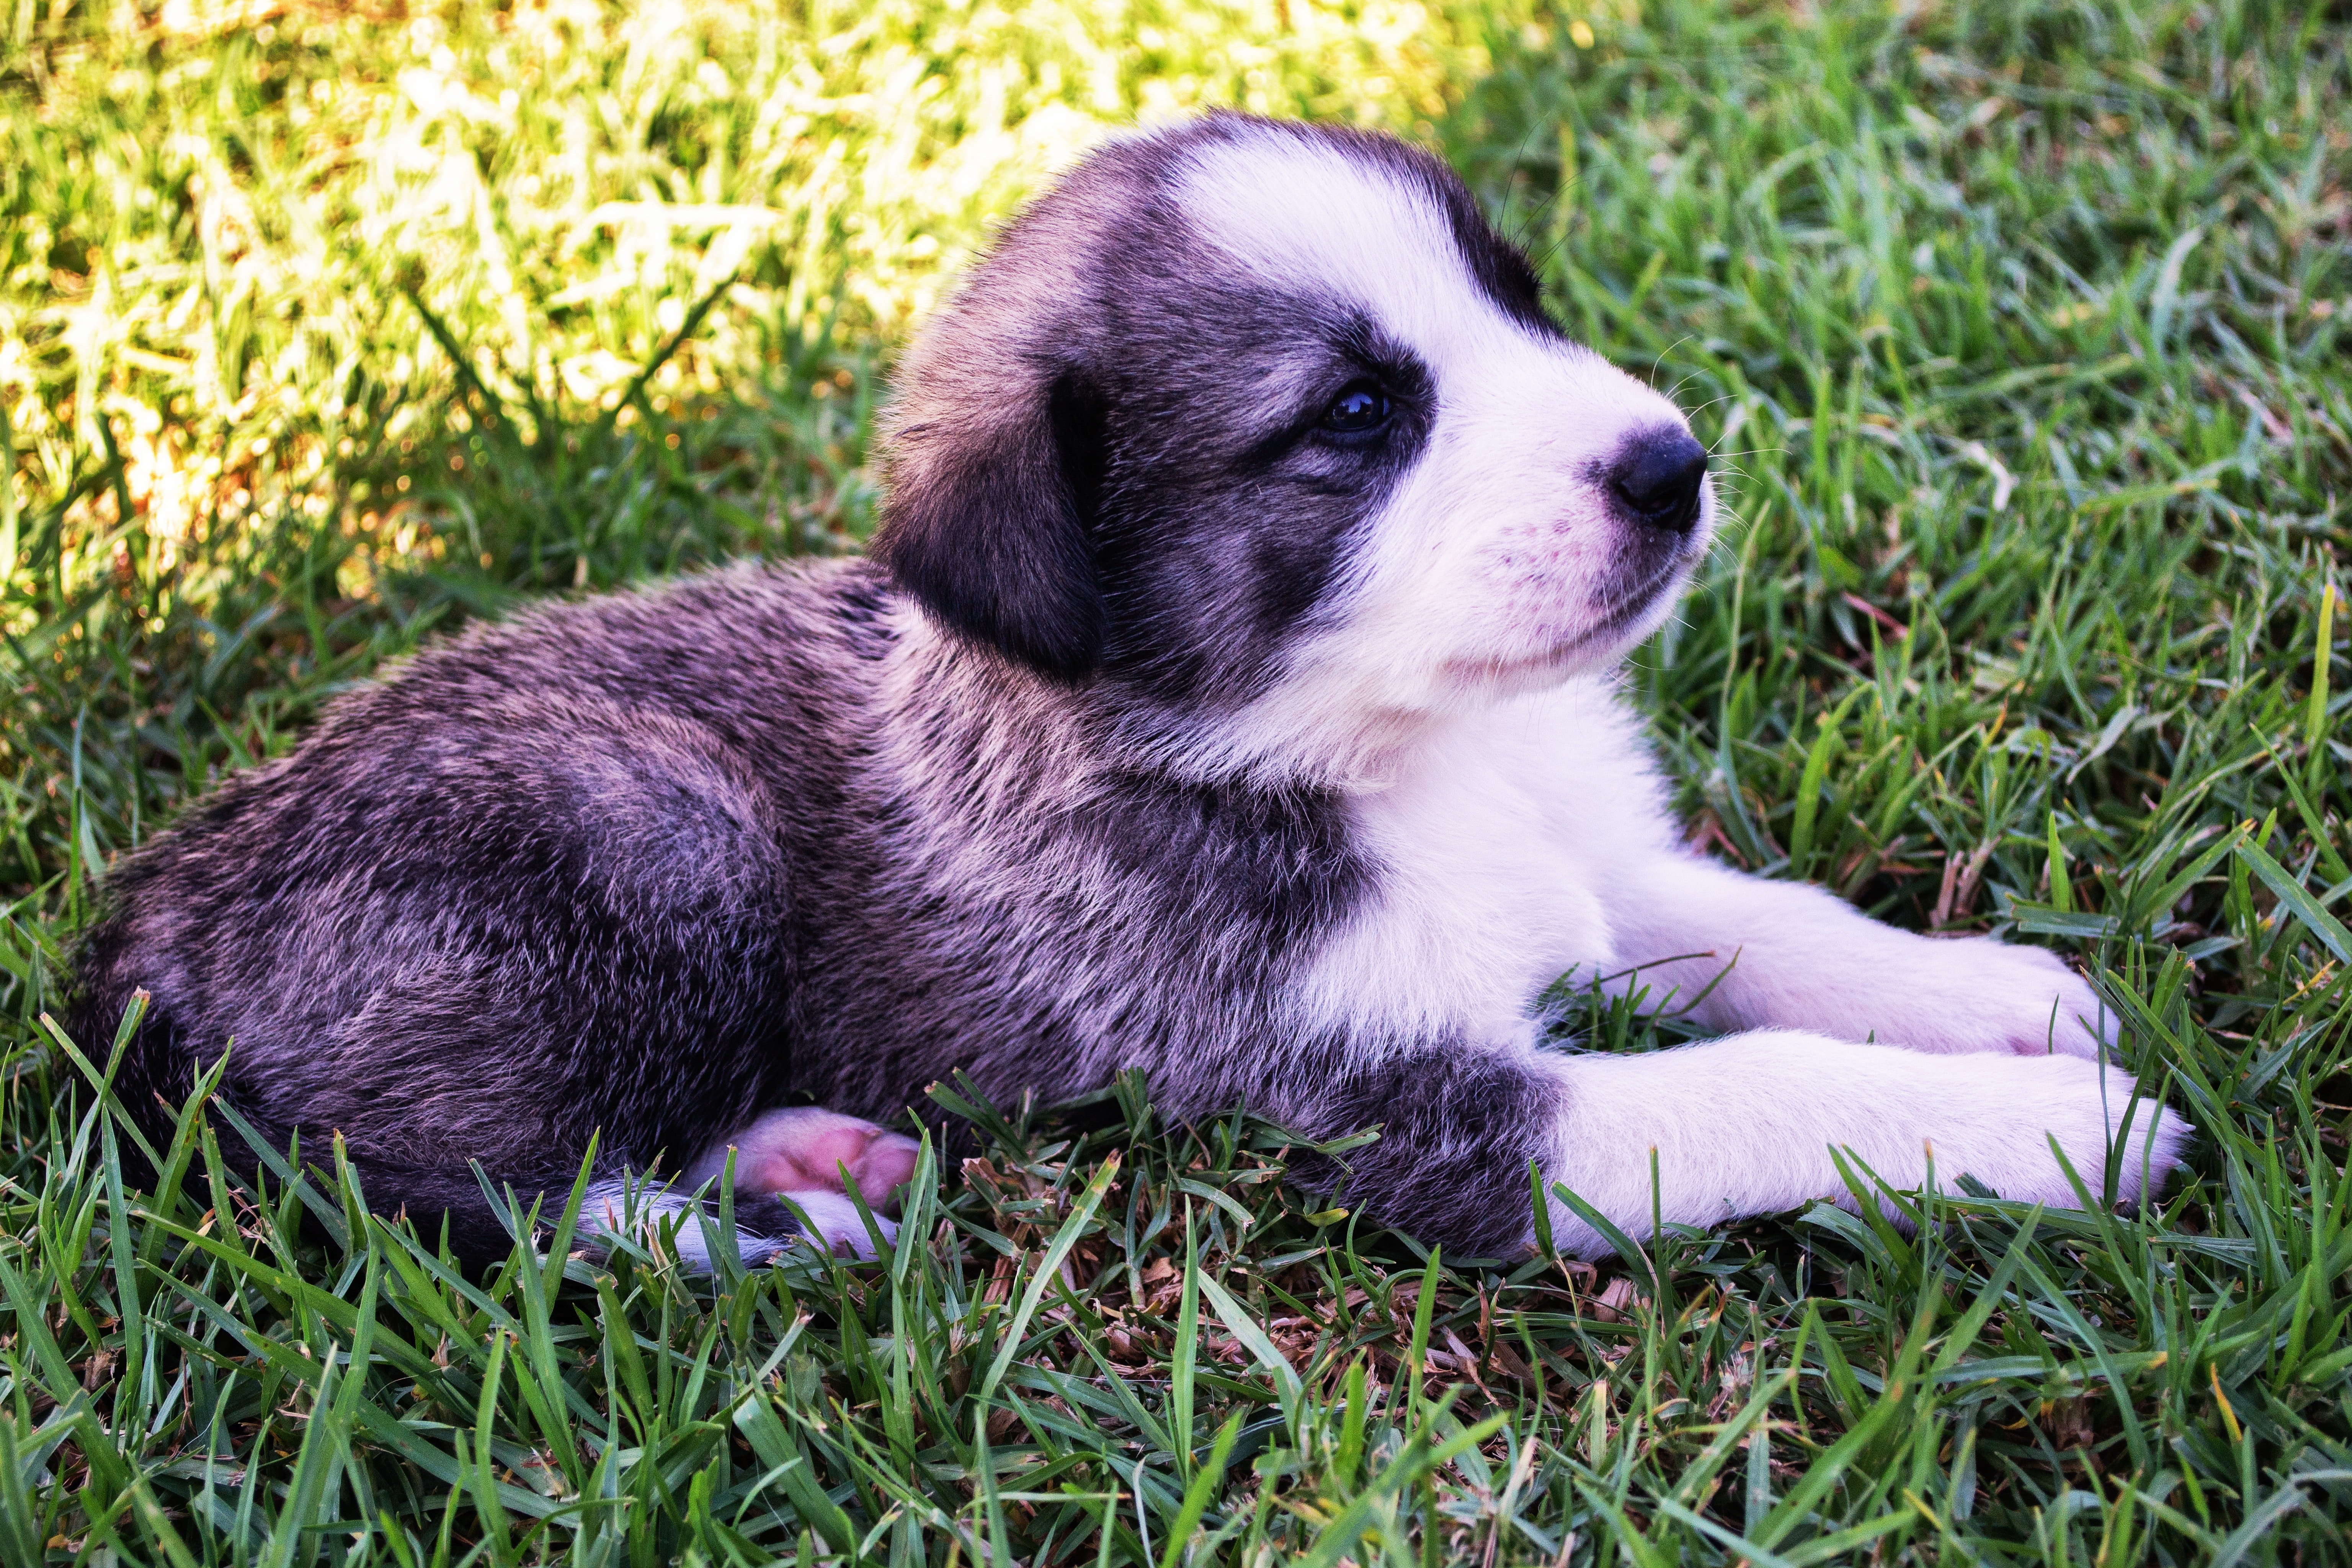 Black and short coat white puppy photo